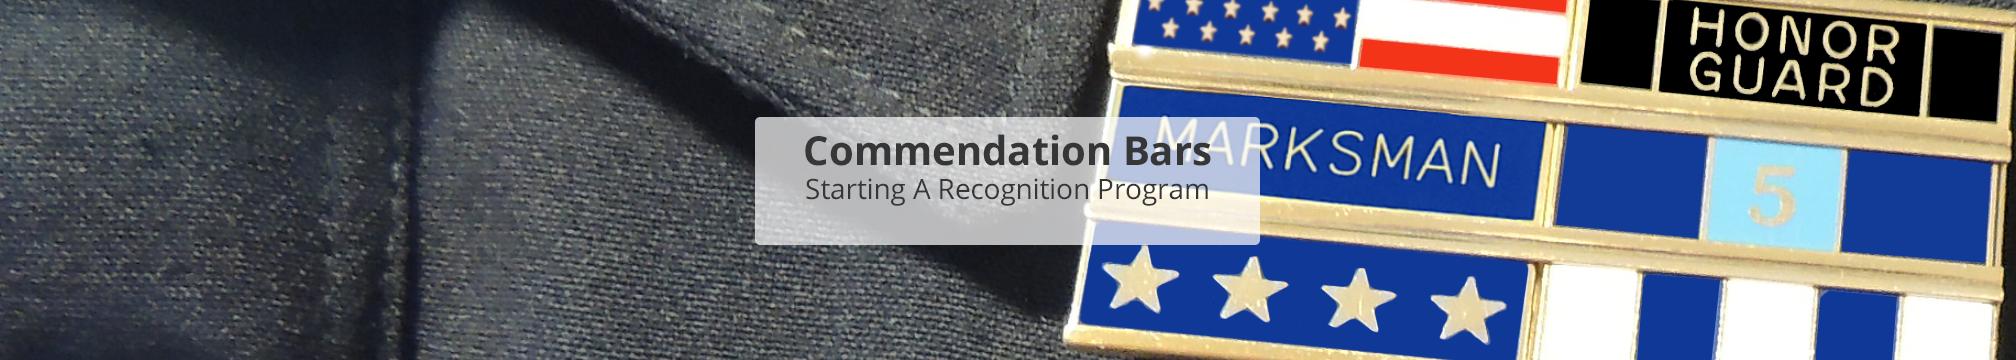 Commendation Bar